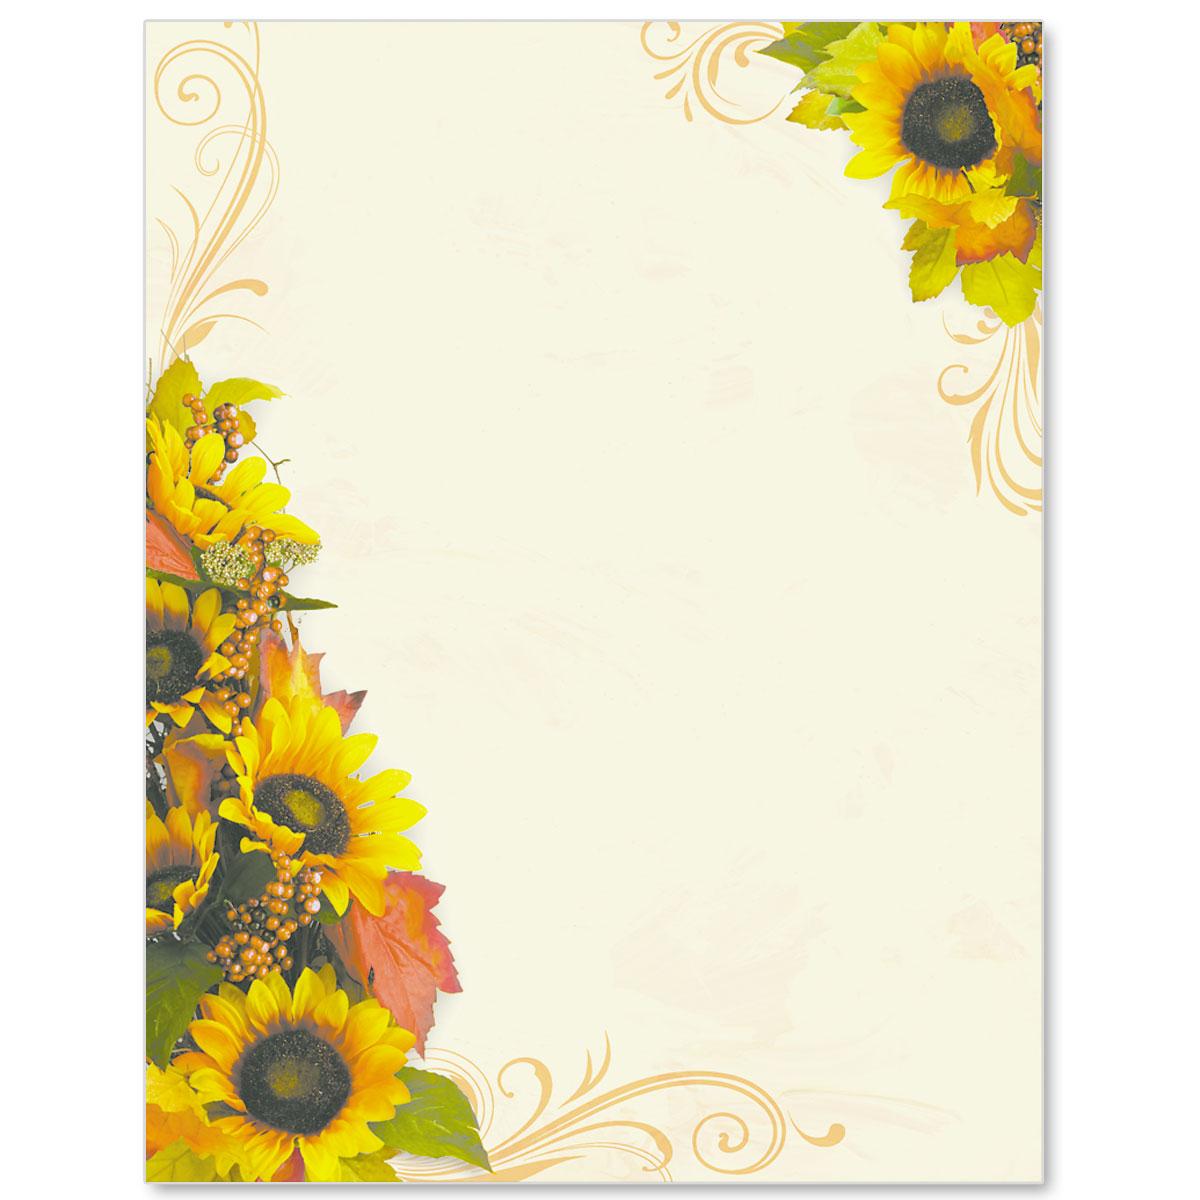 golden sunflowers border papers paperdirect s Preschool Graduation Clip Art Graduation Quotes